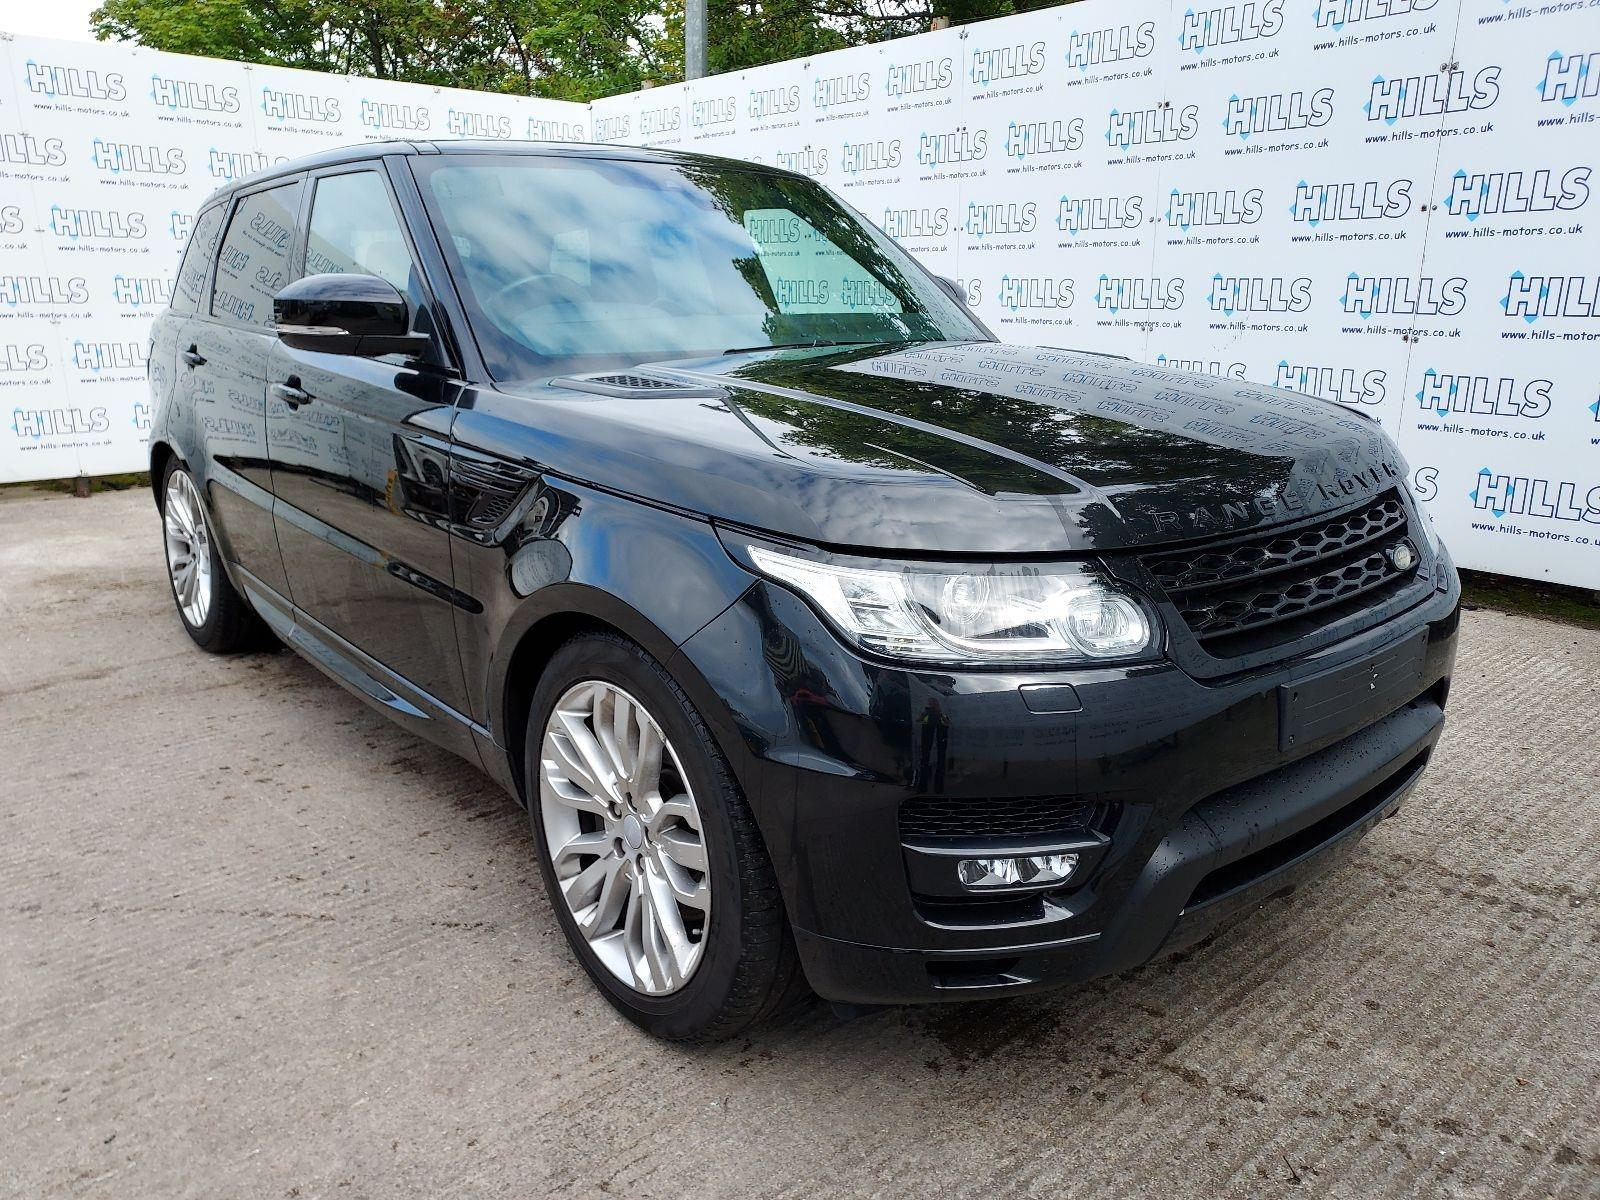 2017 Land Rover Range Rover Sport SDV6 HSE 2993cc TURBO Diesel Automatic 8 Speed ESTATE